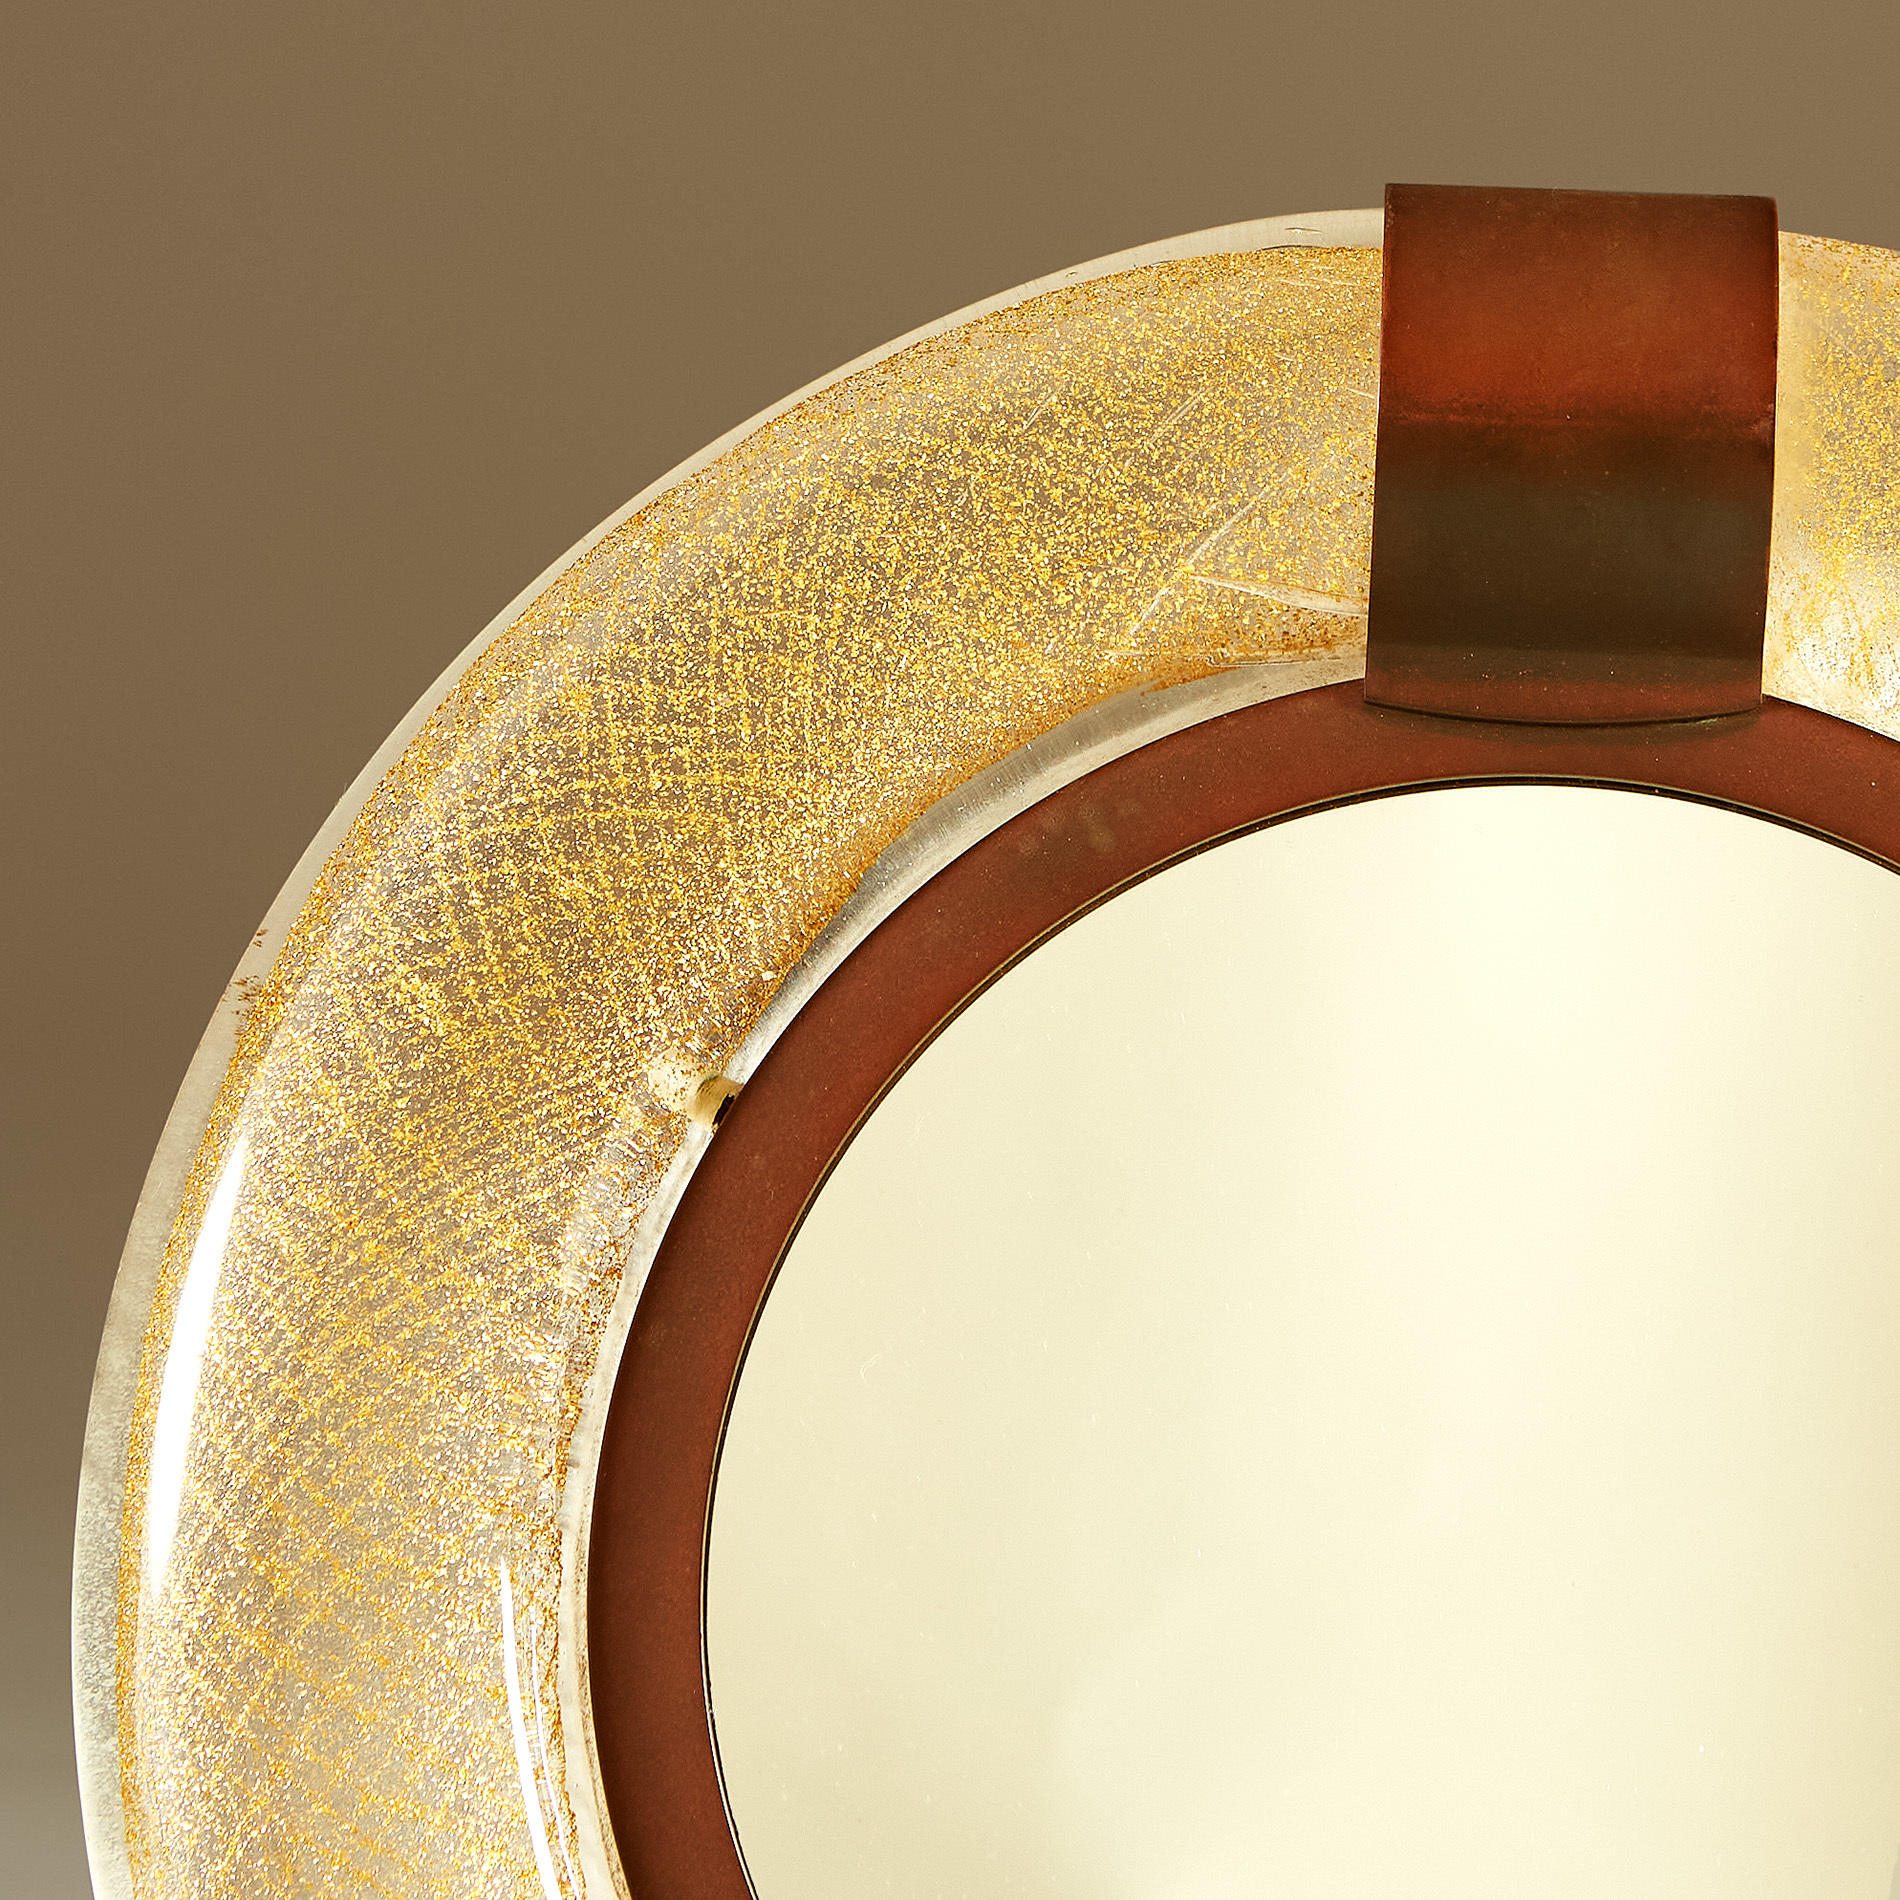 Murano Circular Gold Flecked Mirror 20210427 0014 V1